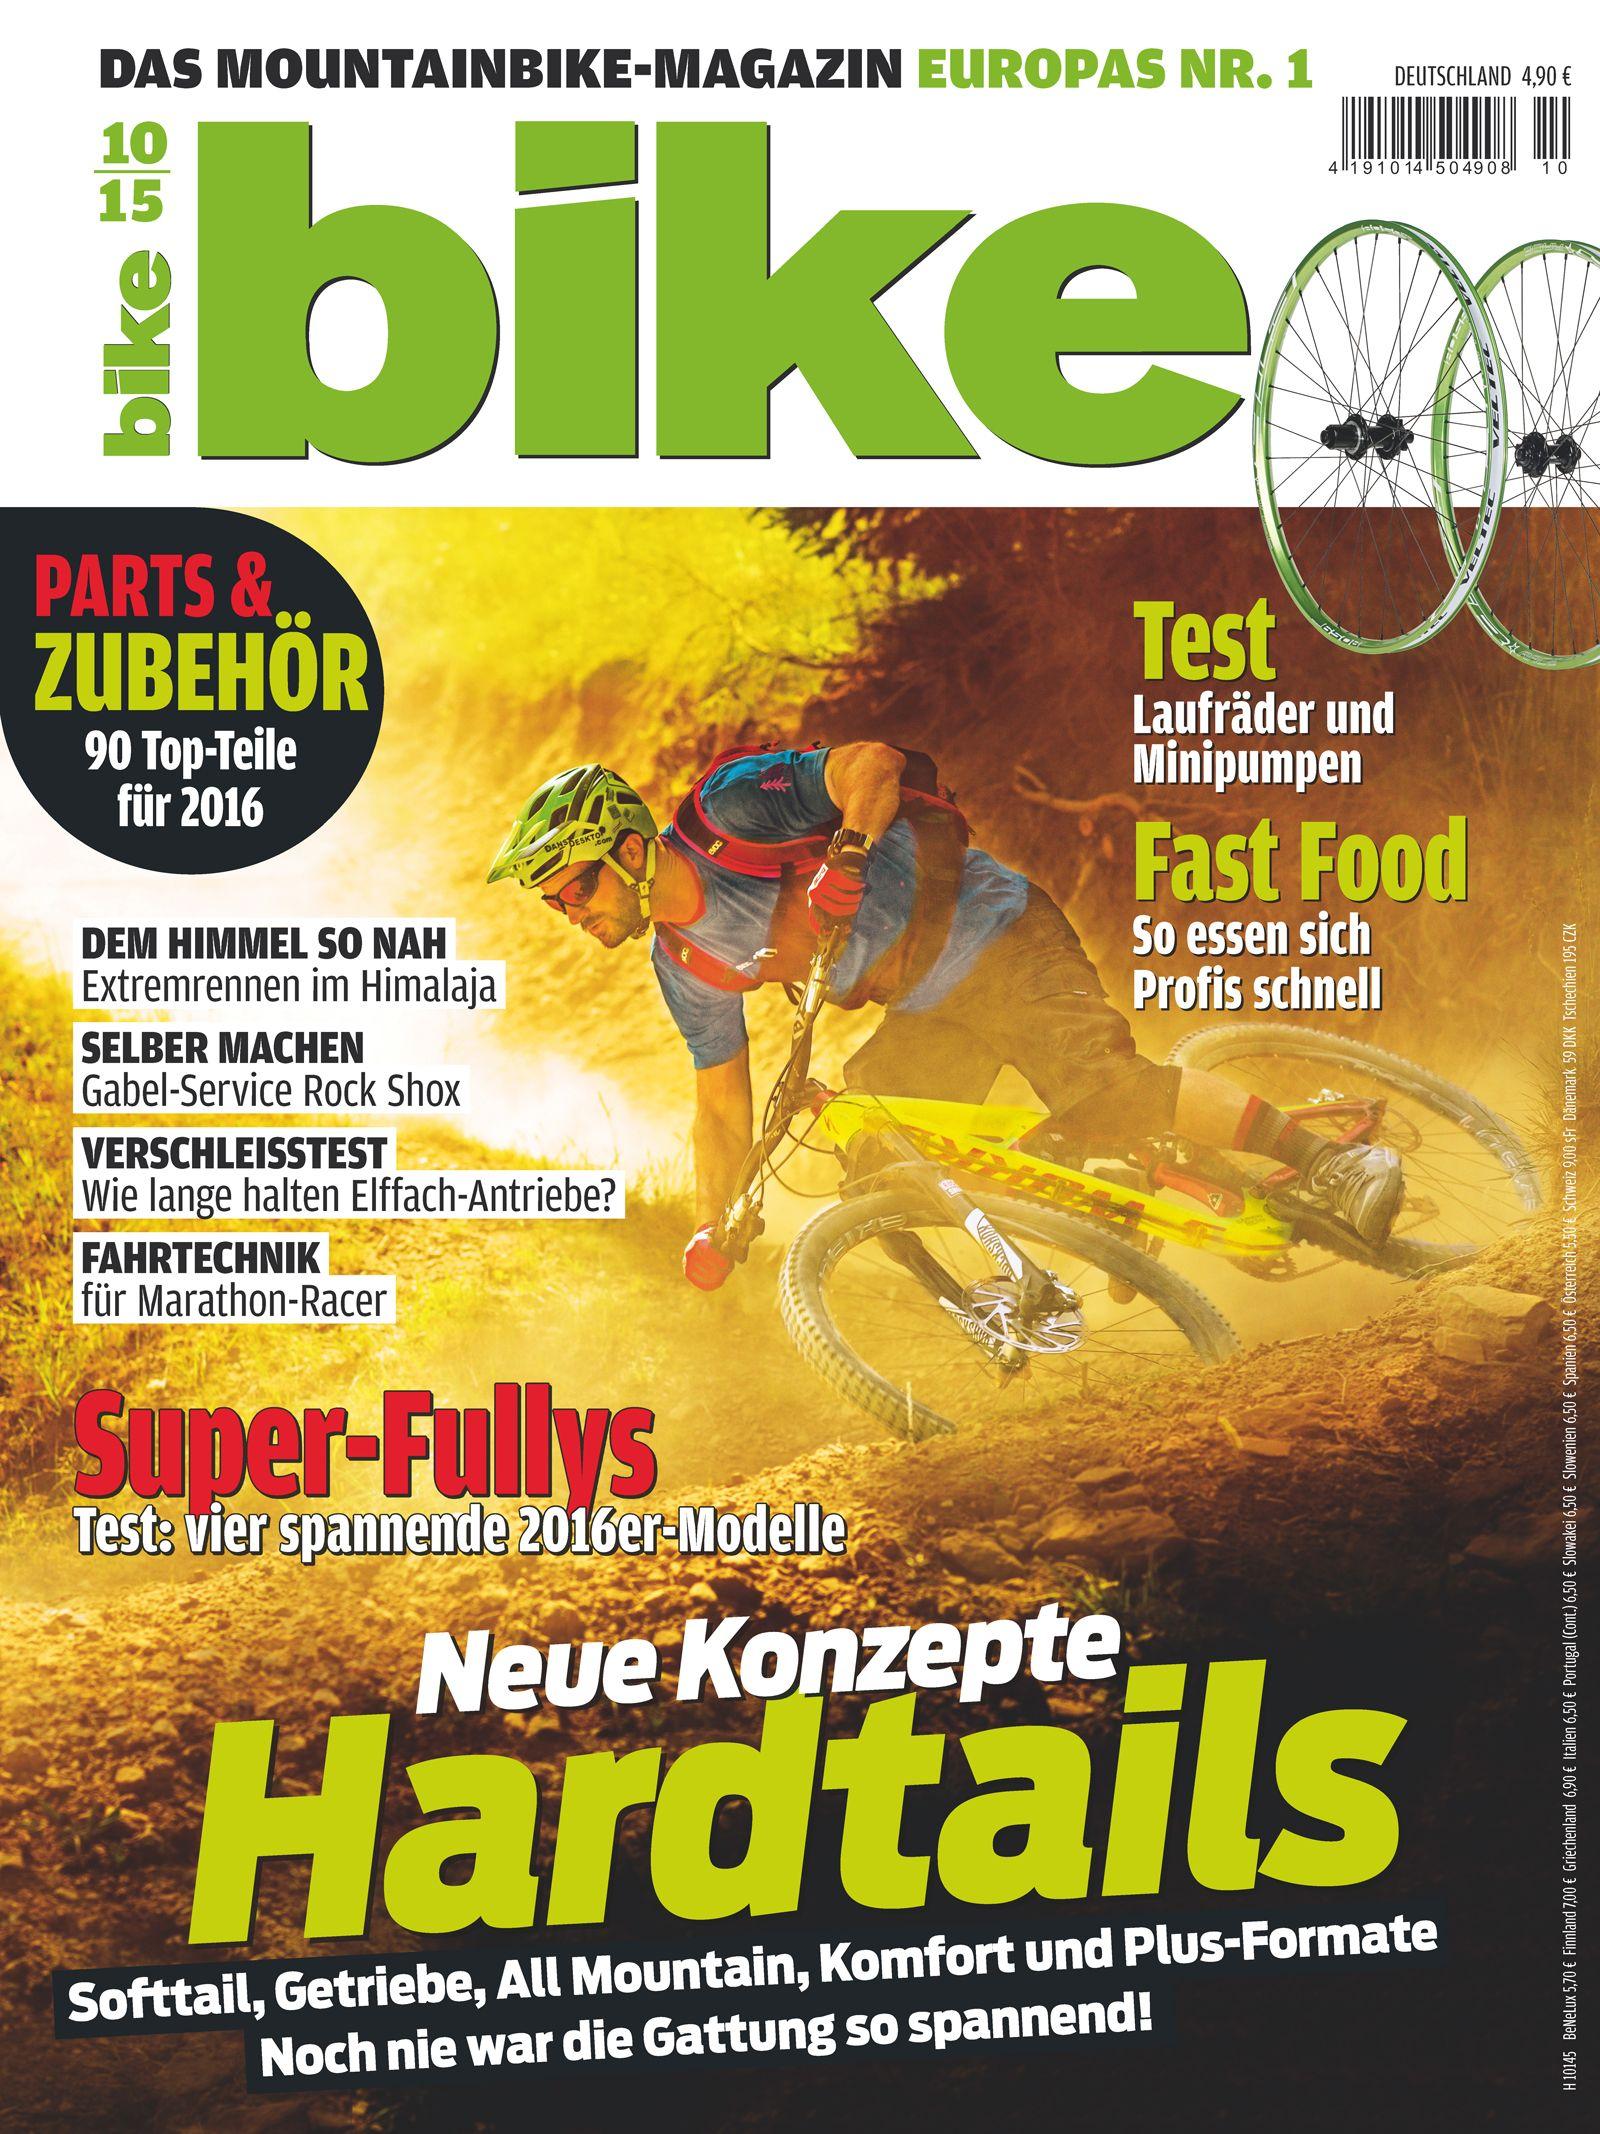 COVER Bike Magazin